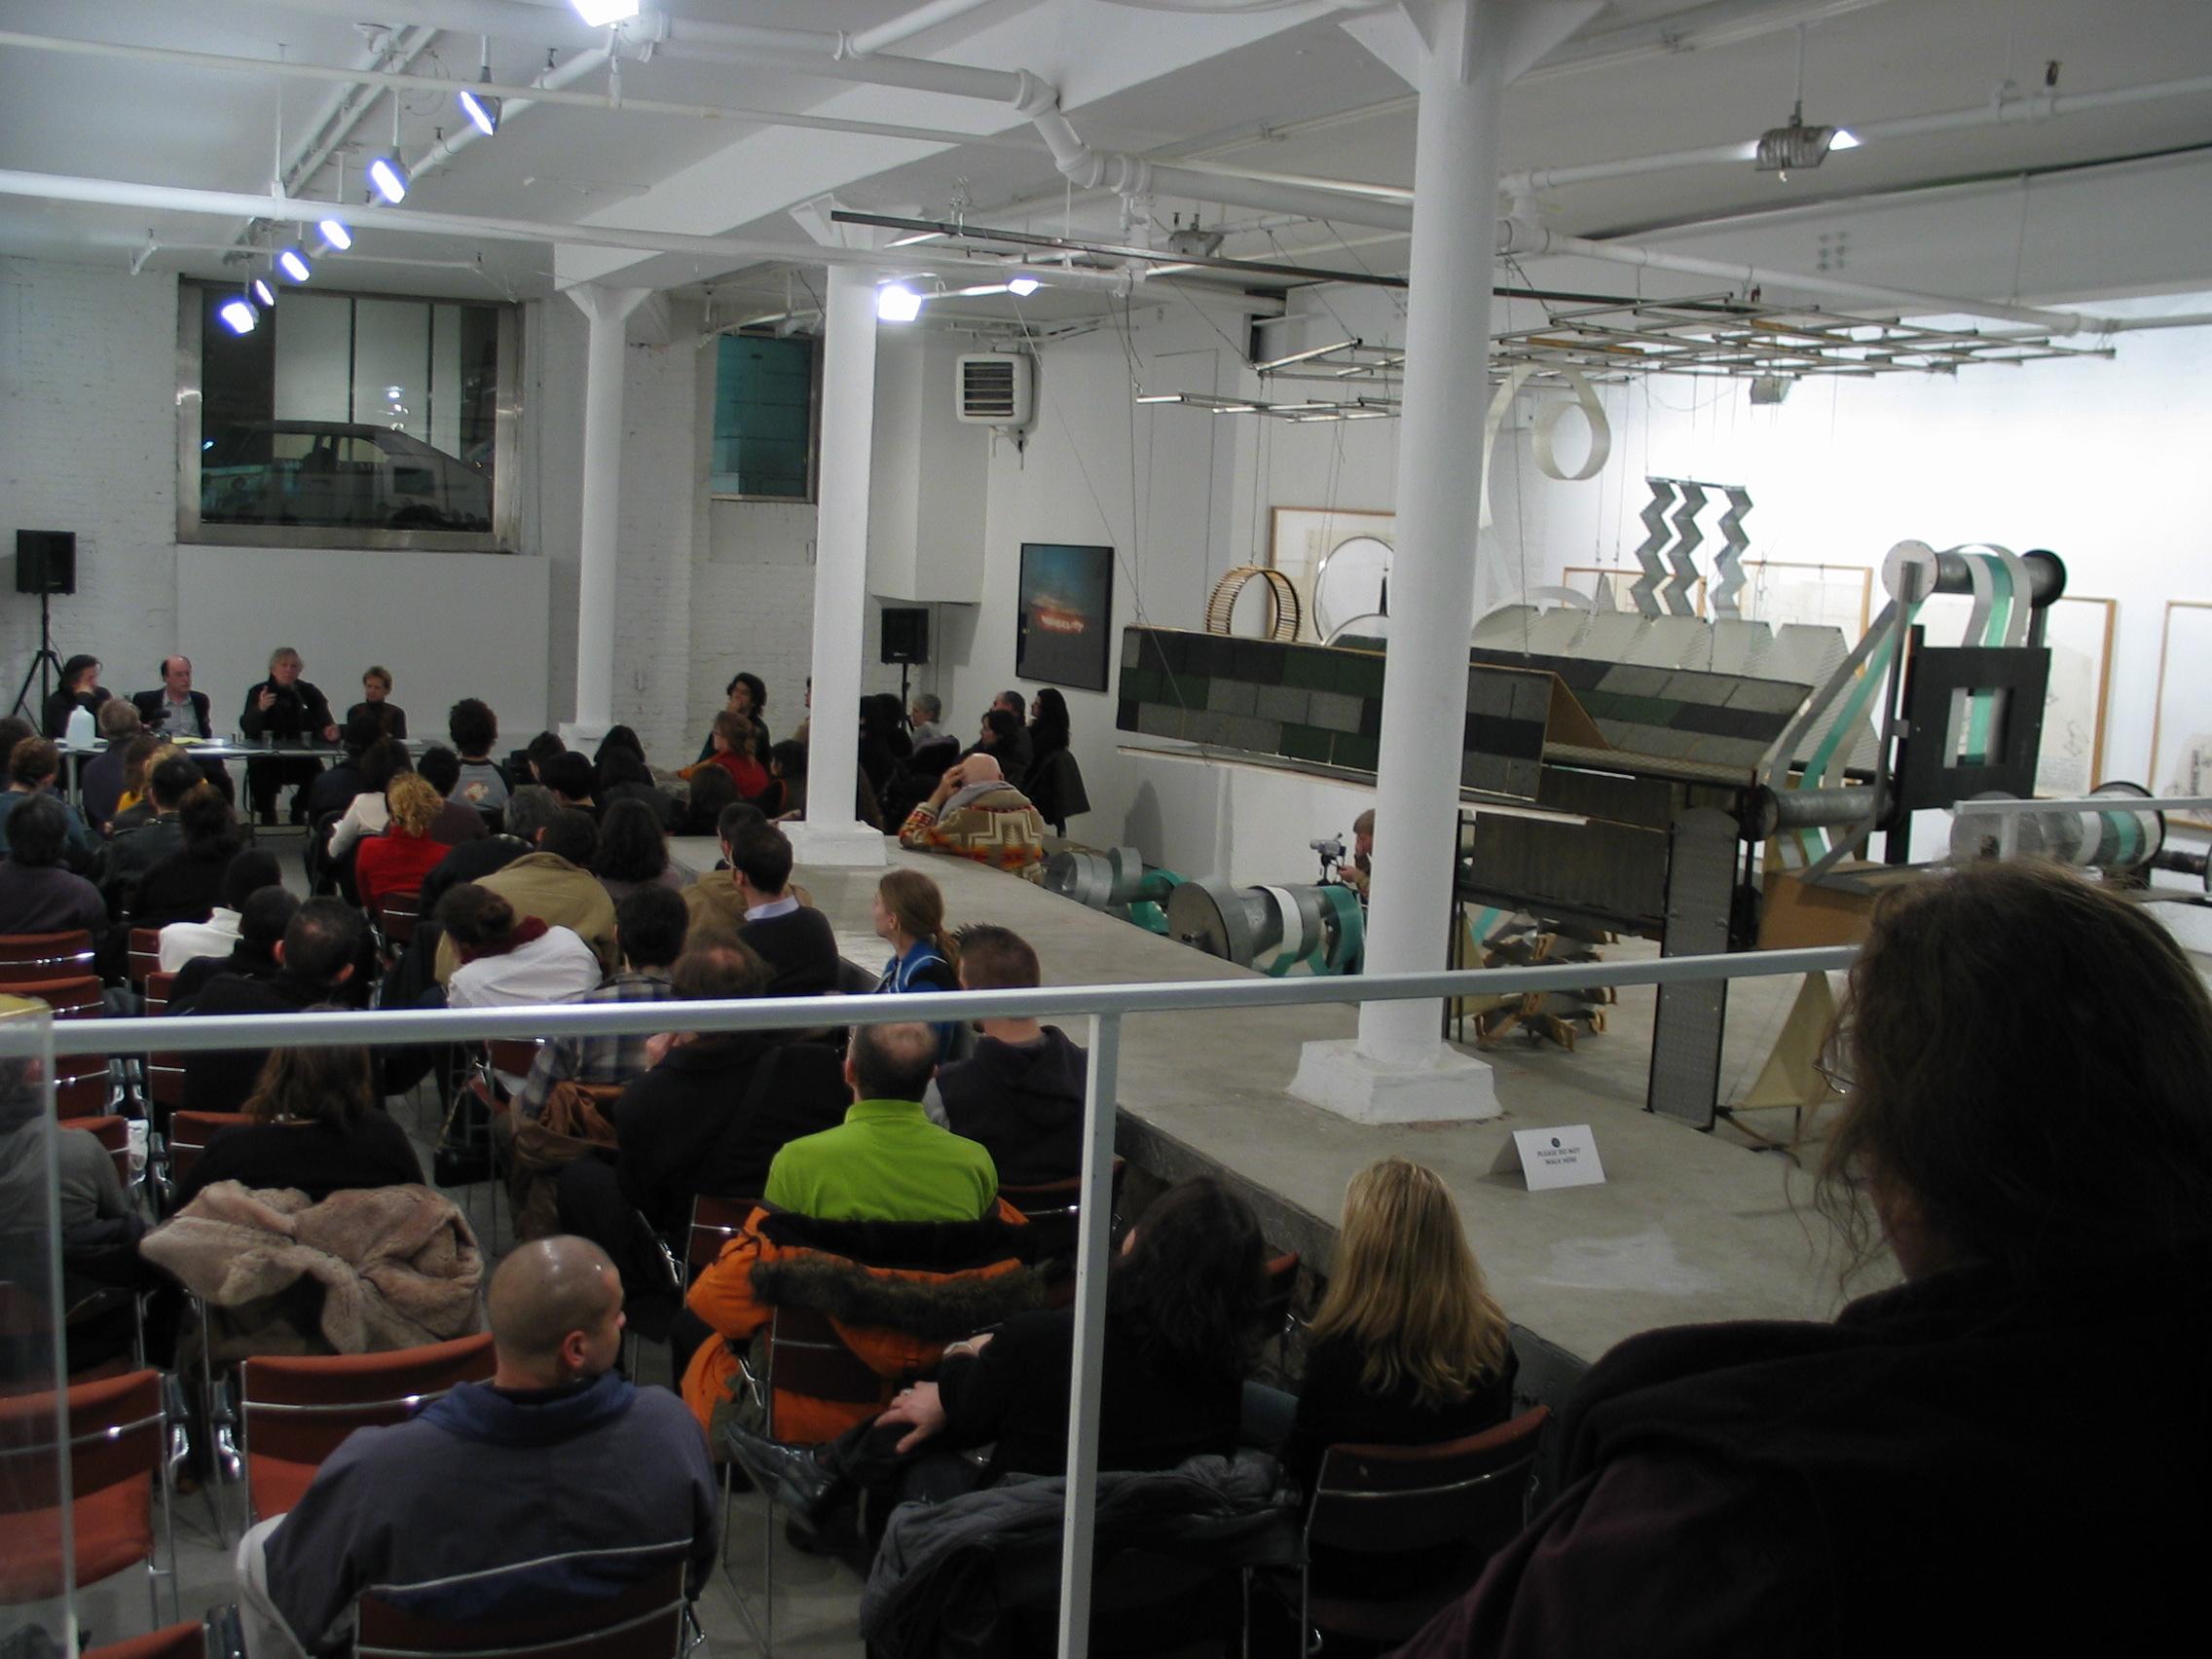 Dennis Oppenheim - Opening at WhiteBox 1